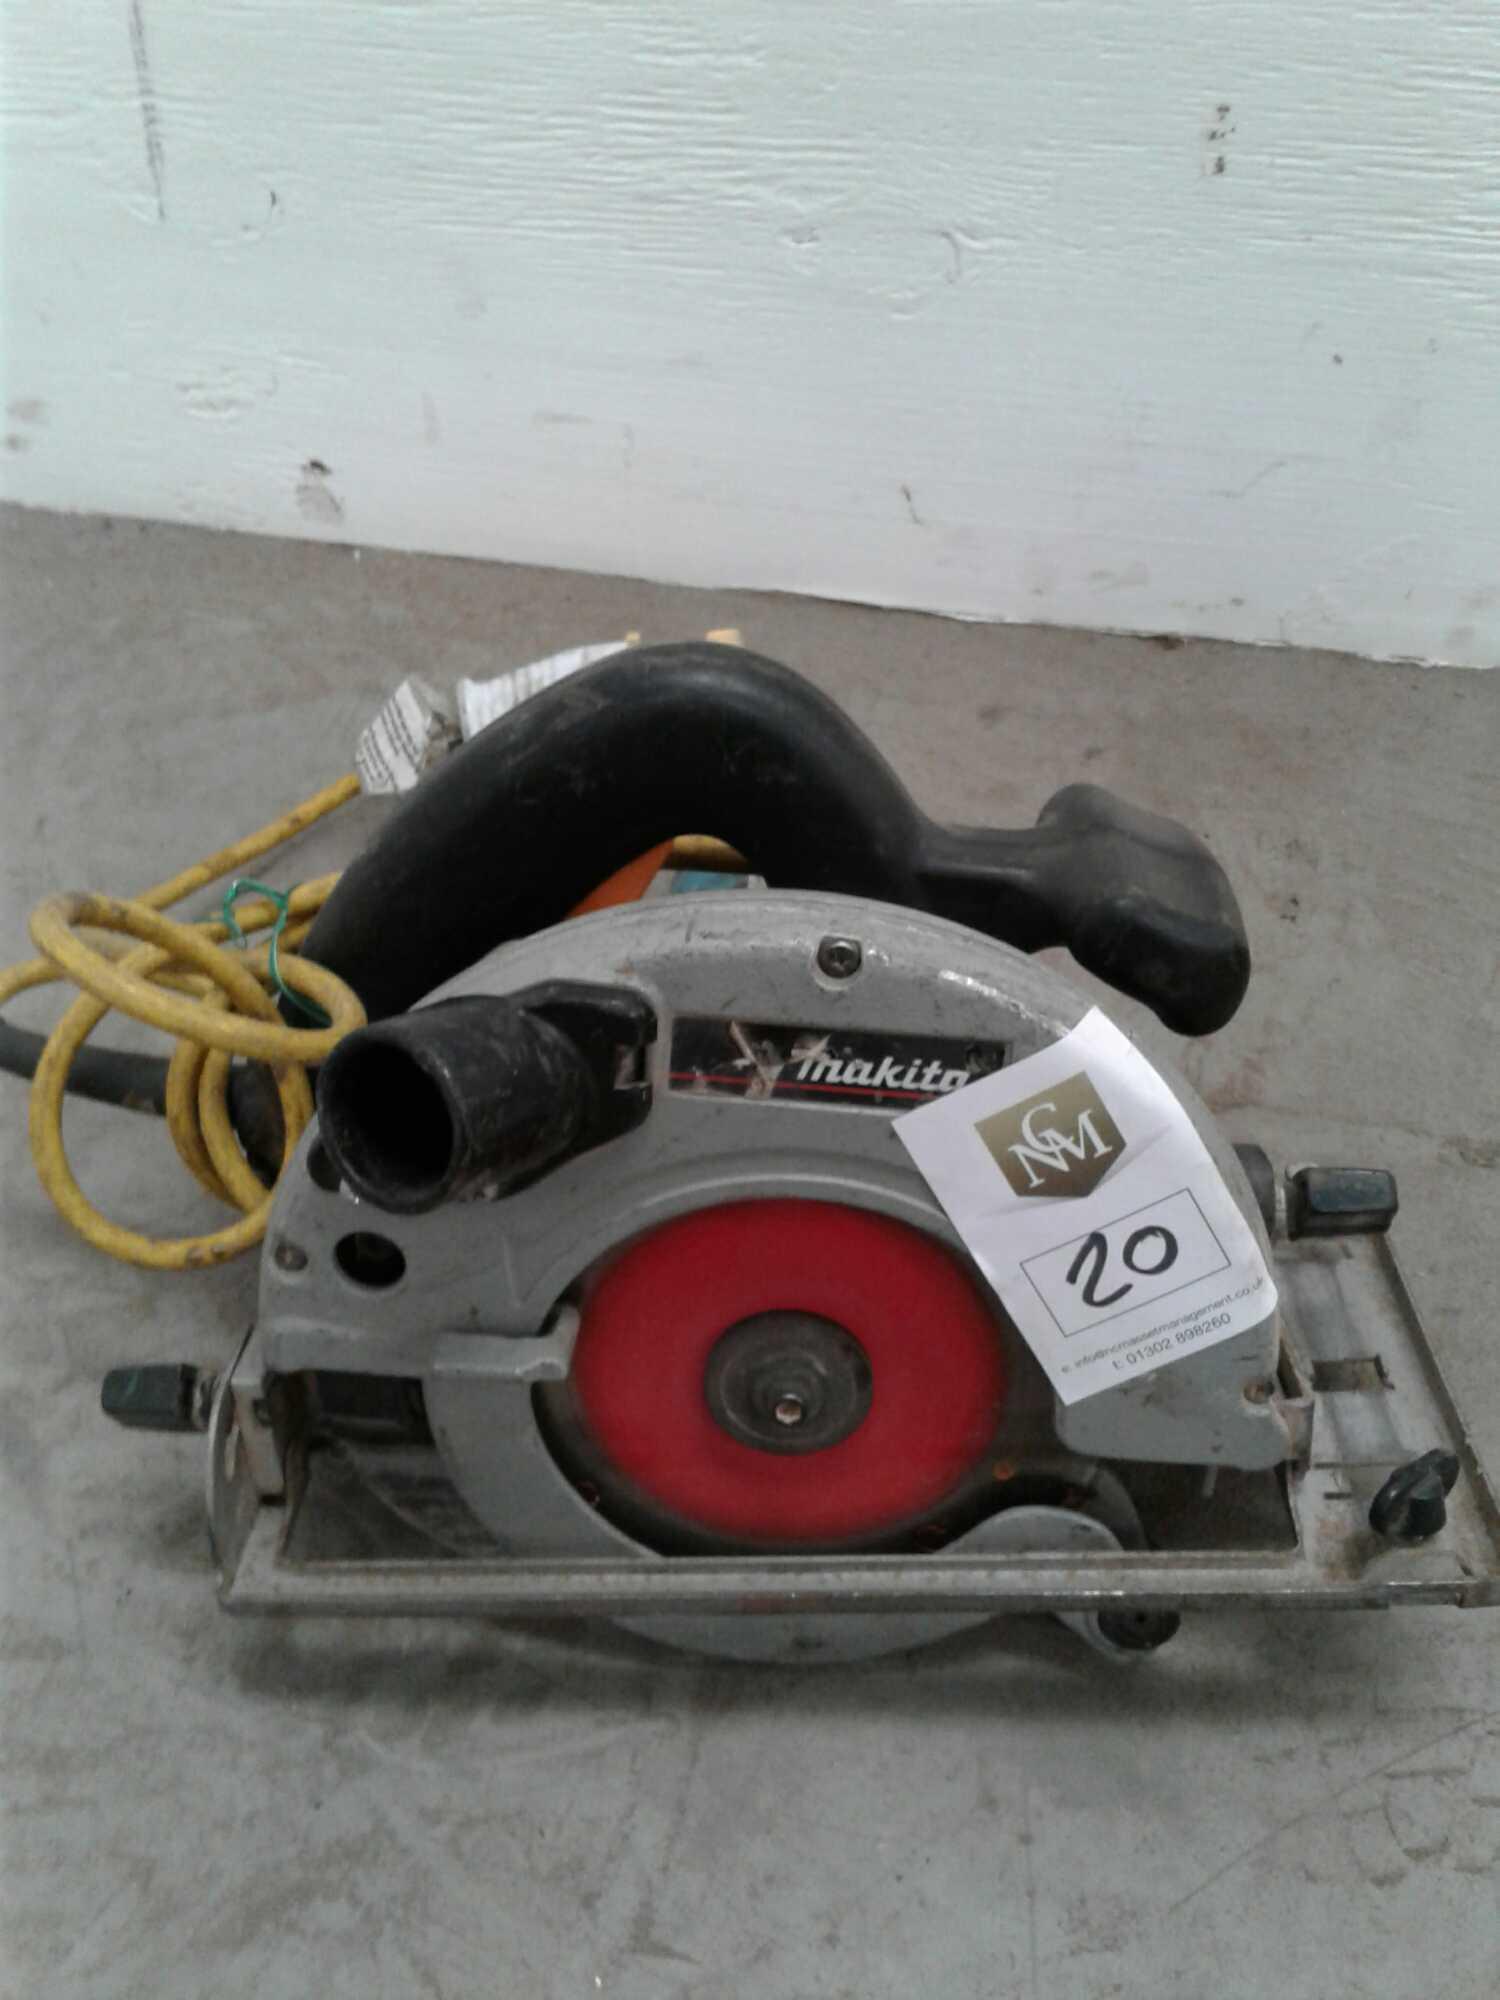 Lot 20 - Makita circular saw 110 v